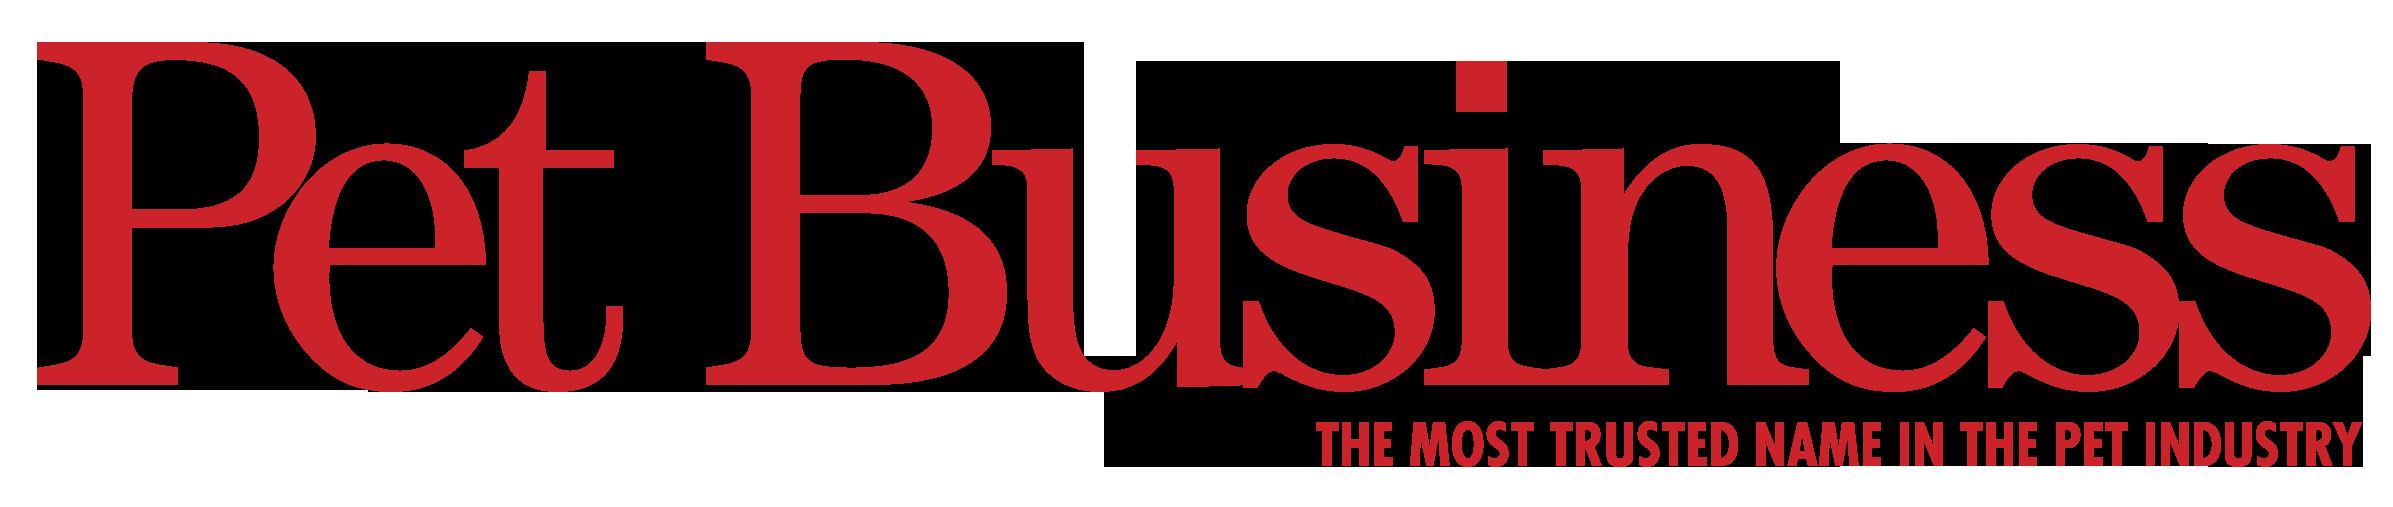 PBN_logo